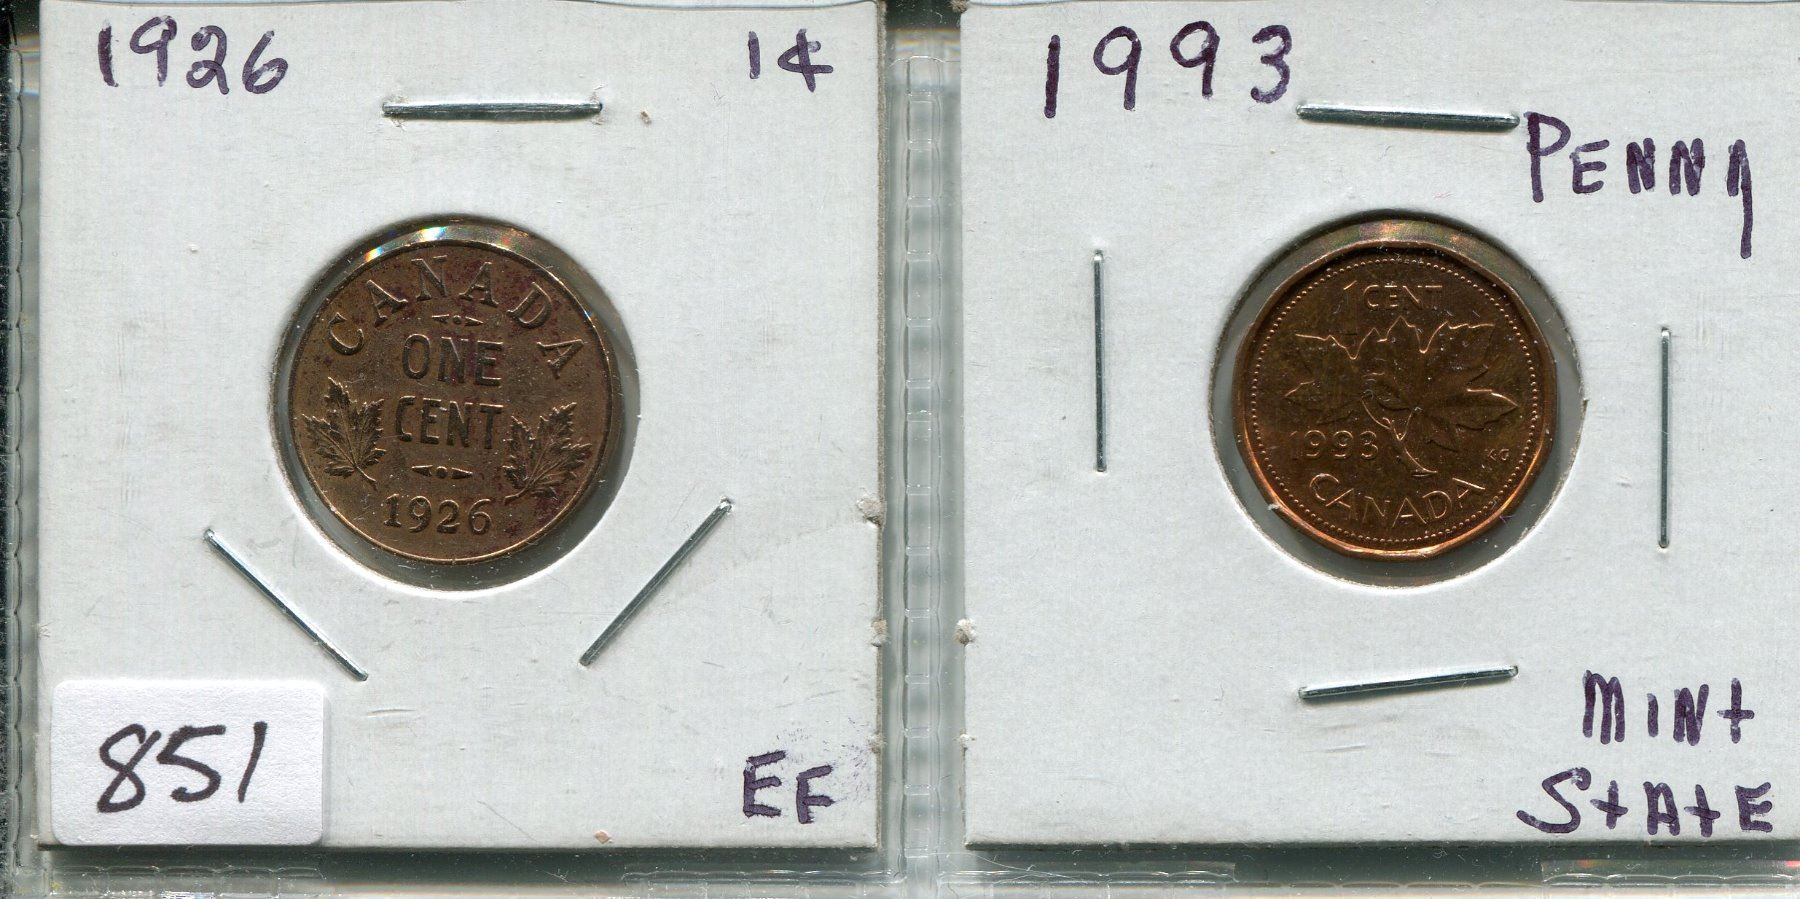 LOT OF 2 CNDN 1 CENT PCS (1926 & 1993)